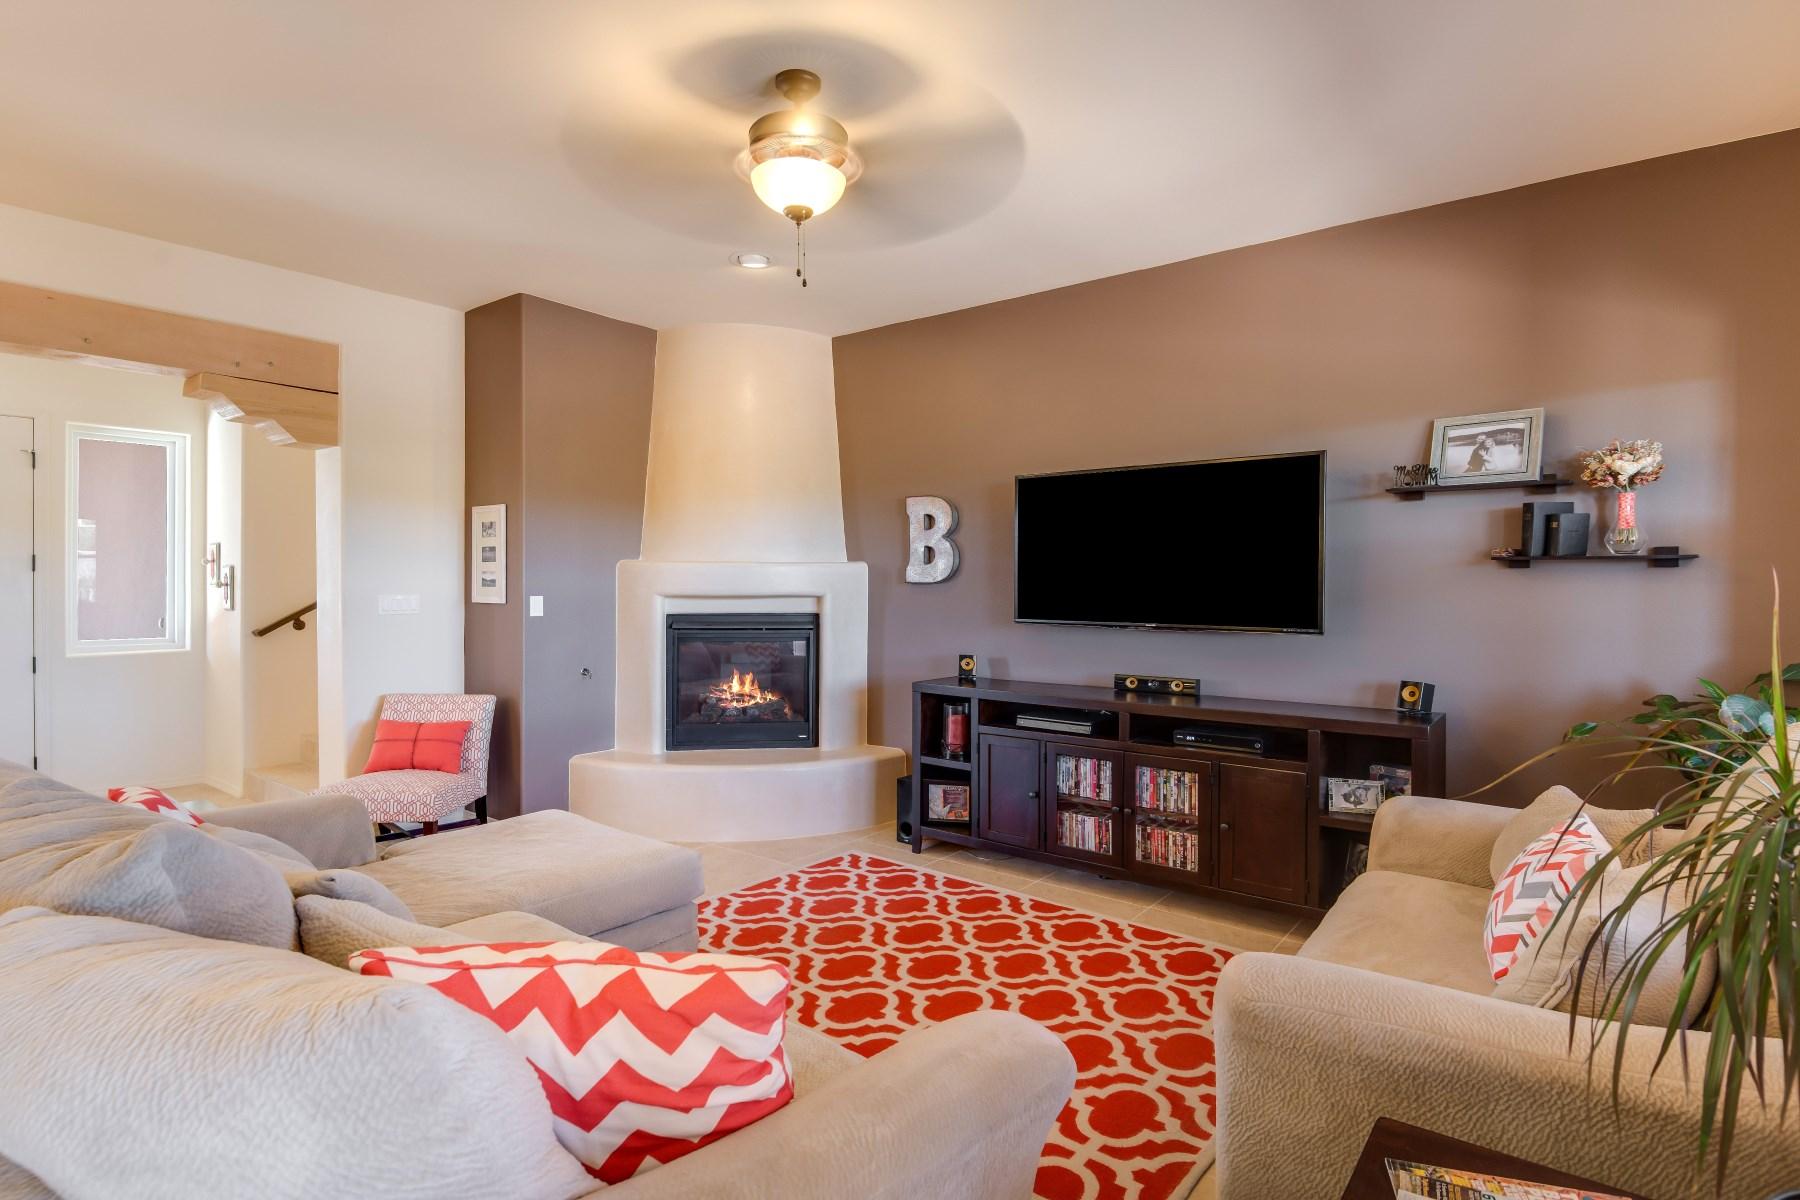 Single Family Home for Sale at 25 Calle Lemita Santa Fe City Northwest, Santa Fe, New Mexico 87507 United States